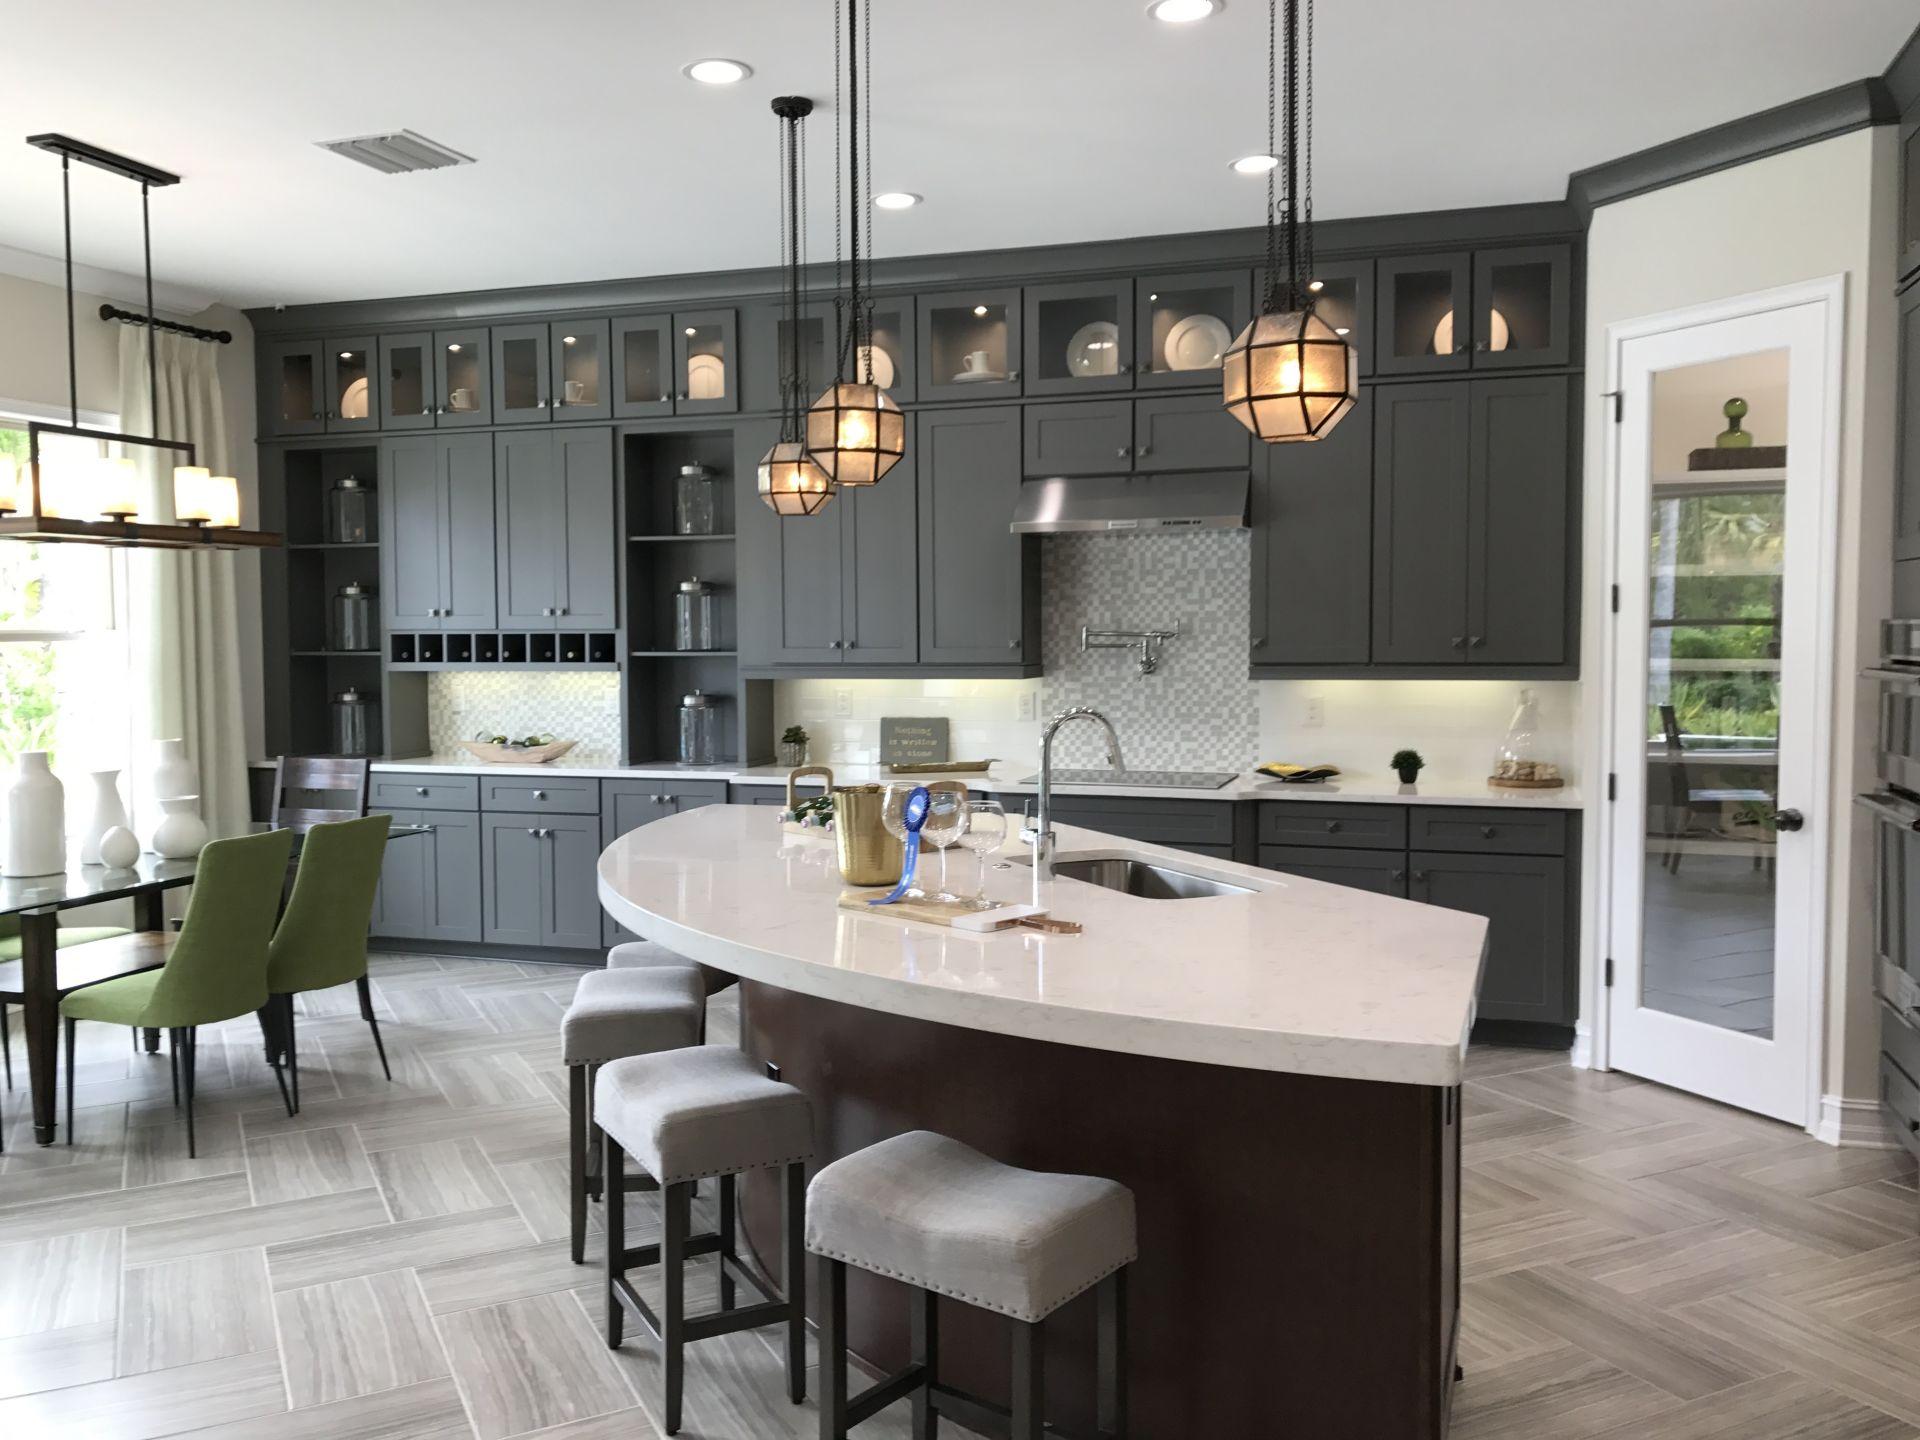 Why a New Construction Home Makes Financial Sense